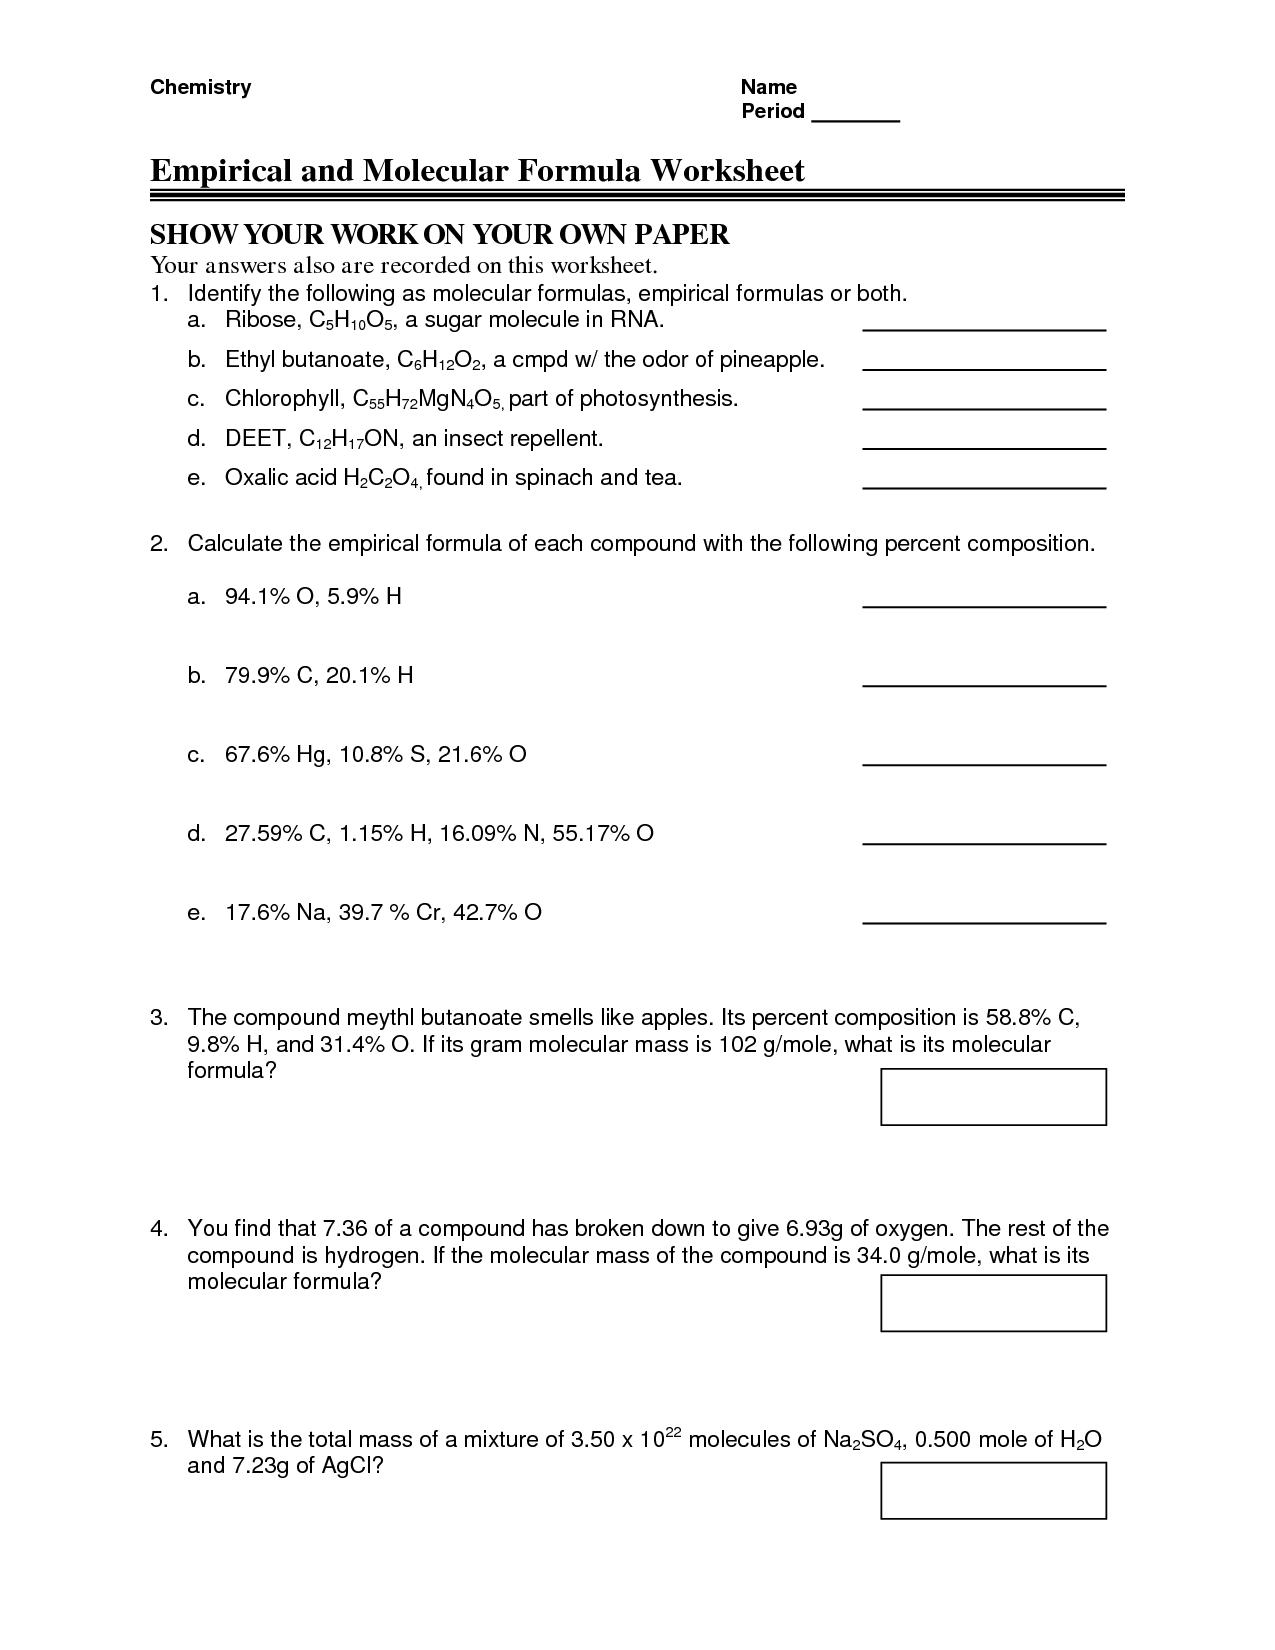 Chemistry Empirical Formula Worksheets